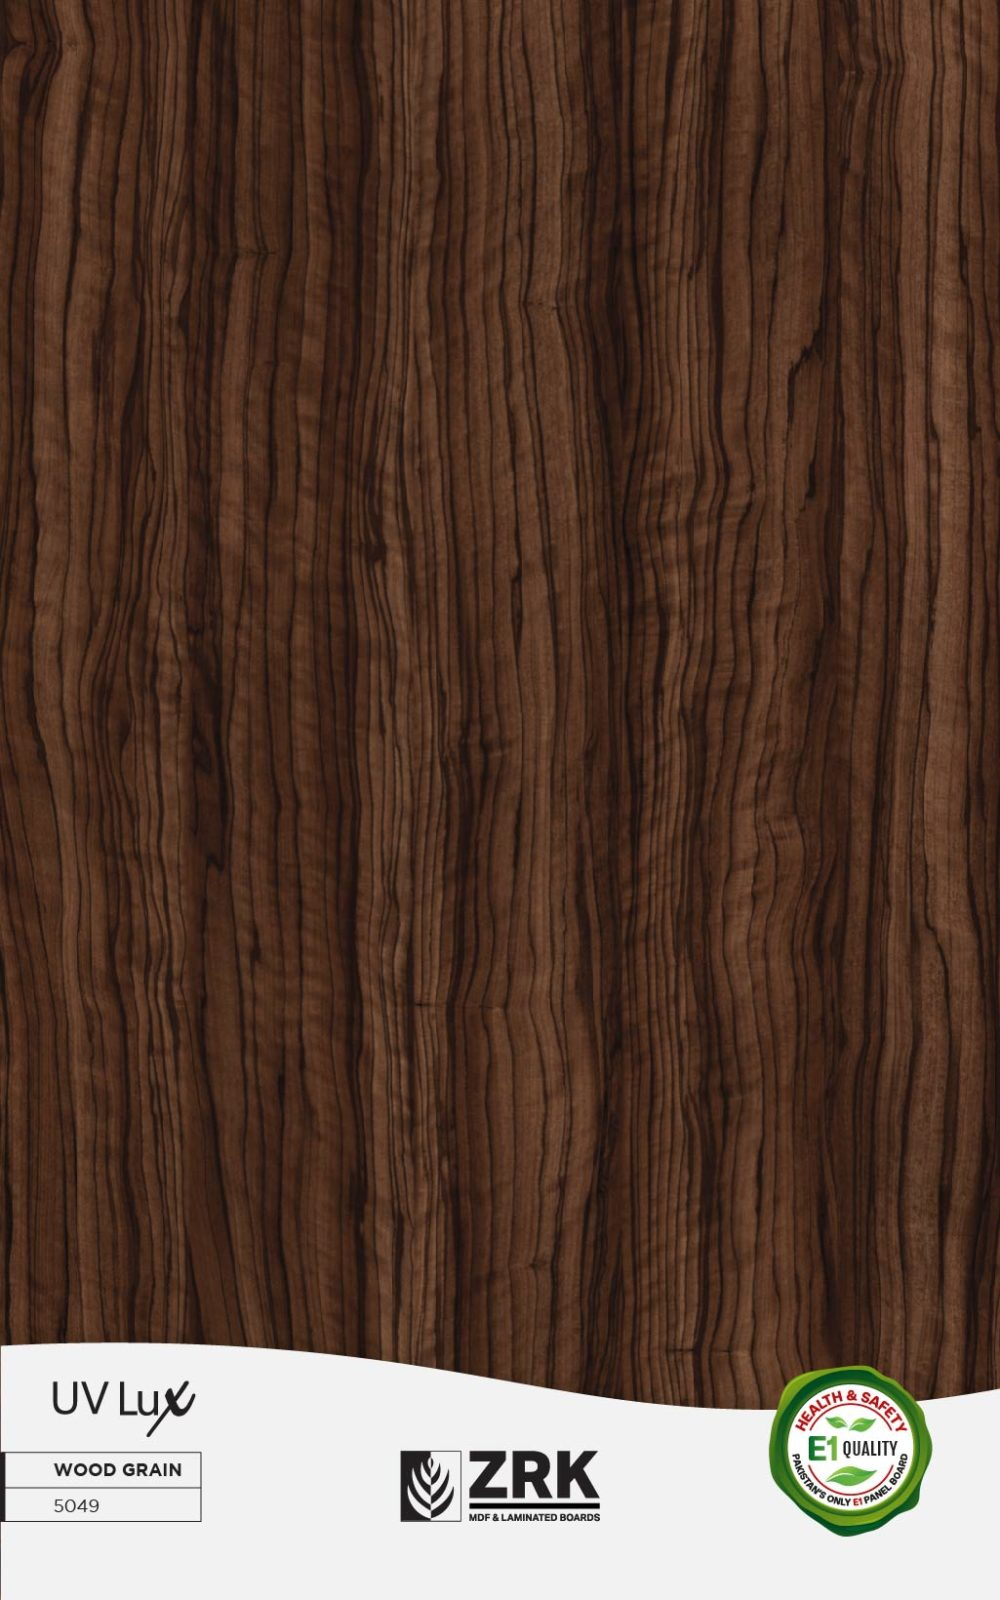 UV LUX - Wood Grain - 5049